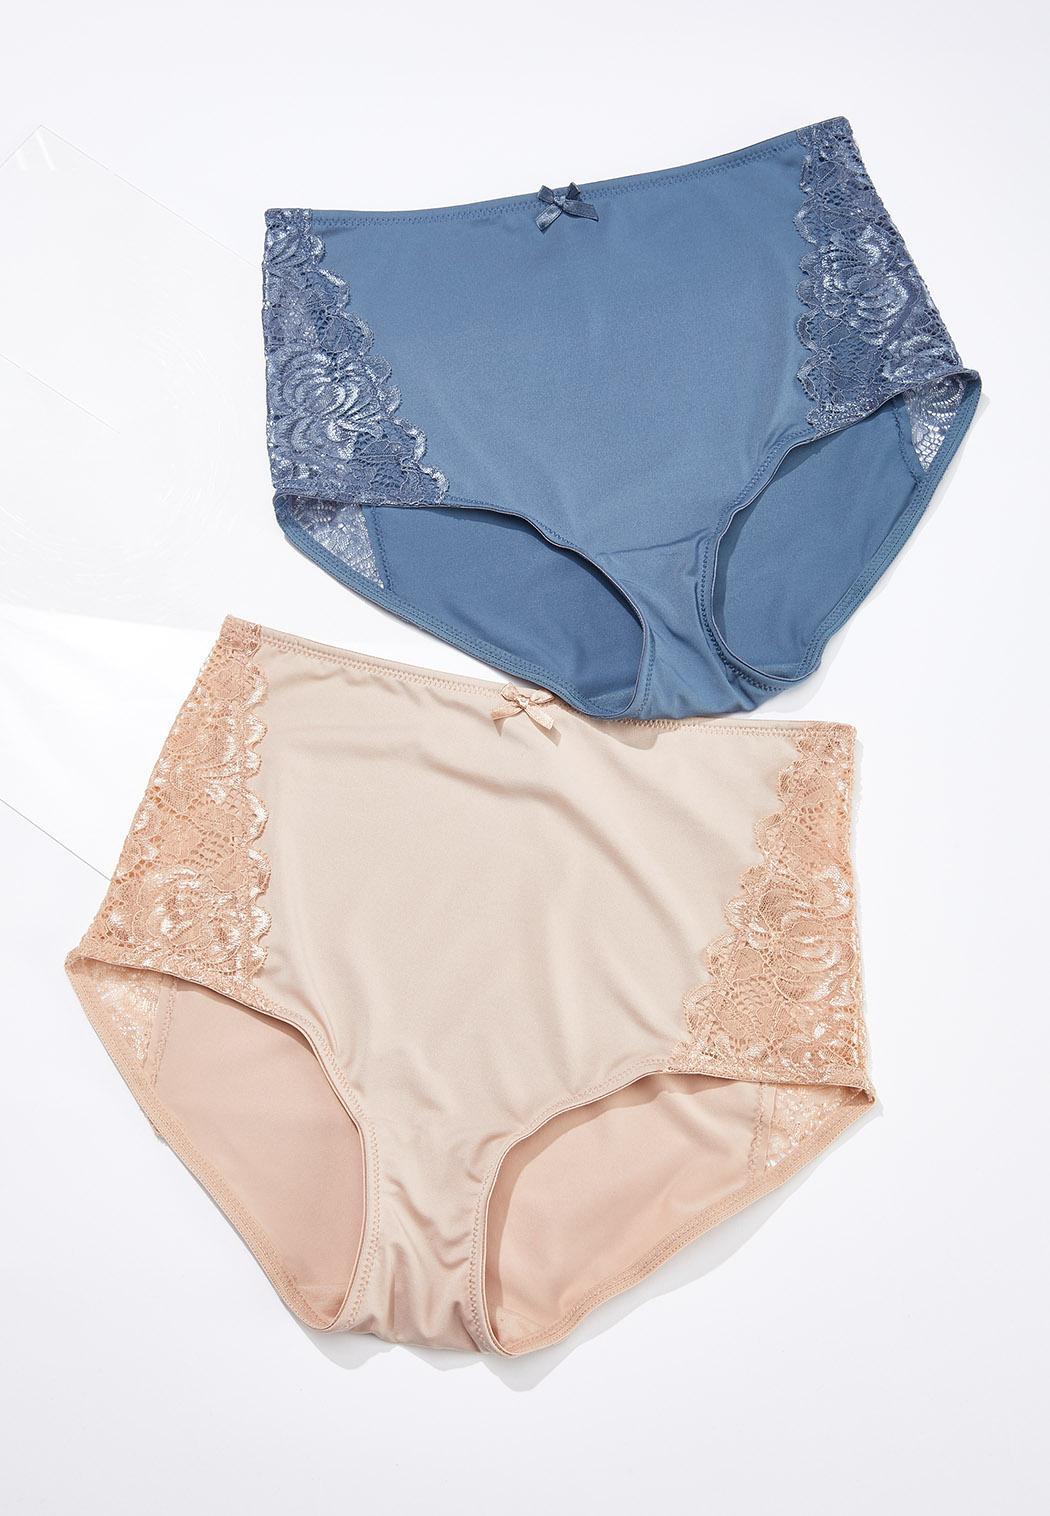 Plus Size High Waist Brief Panty Set